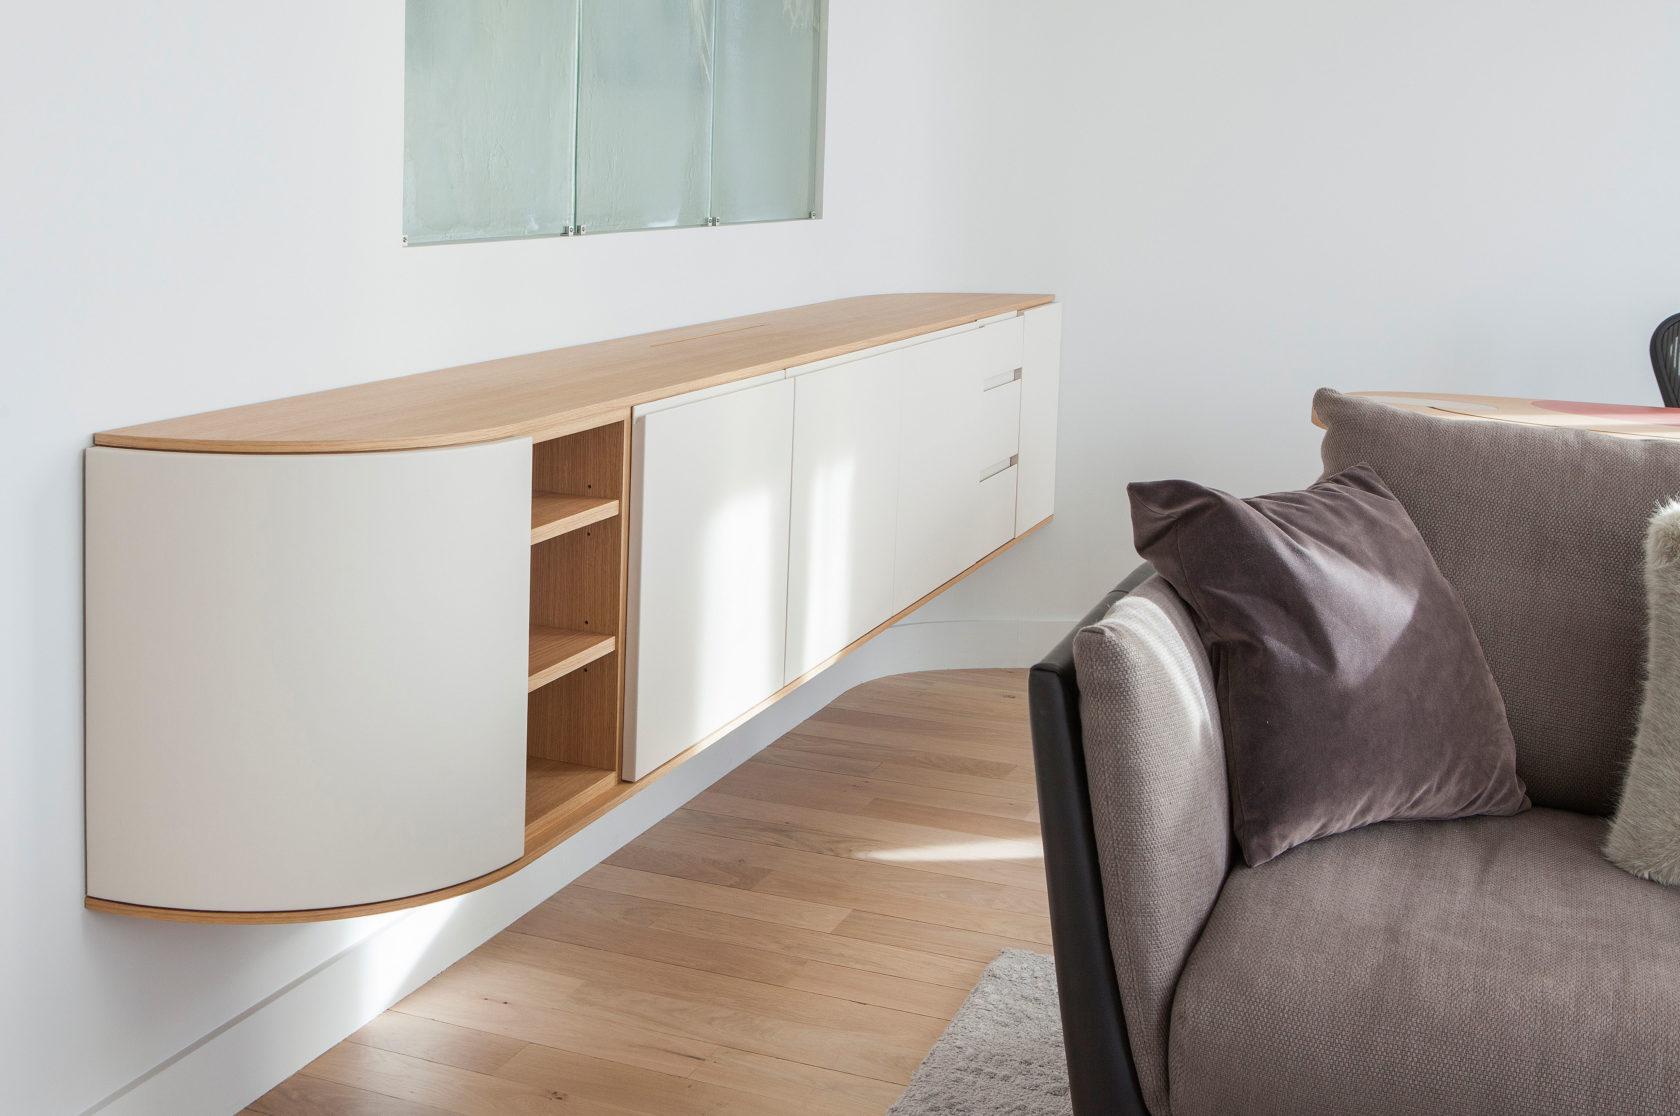 fran ais buffet ludovic avenel b niste cr ateur. Black Bedroom Furniture Sets. Home Design Ideas